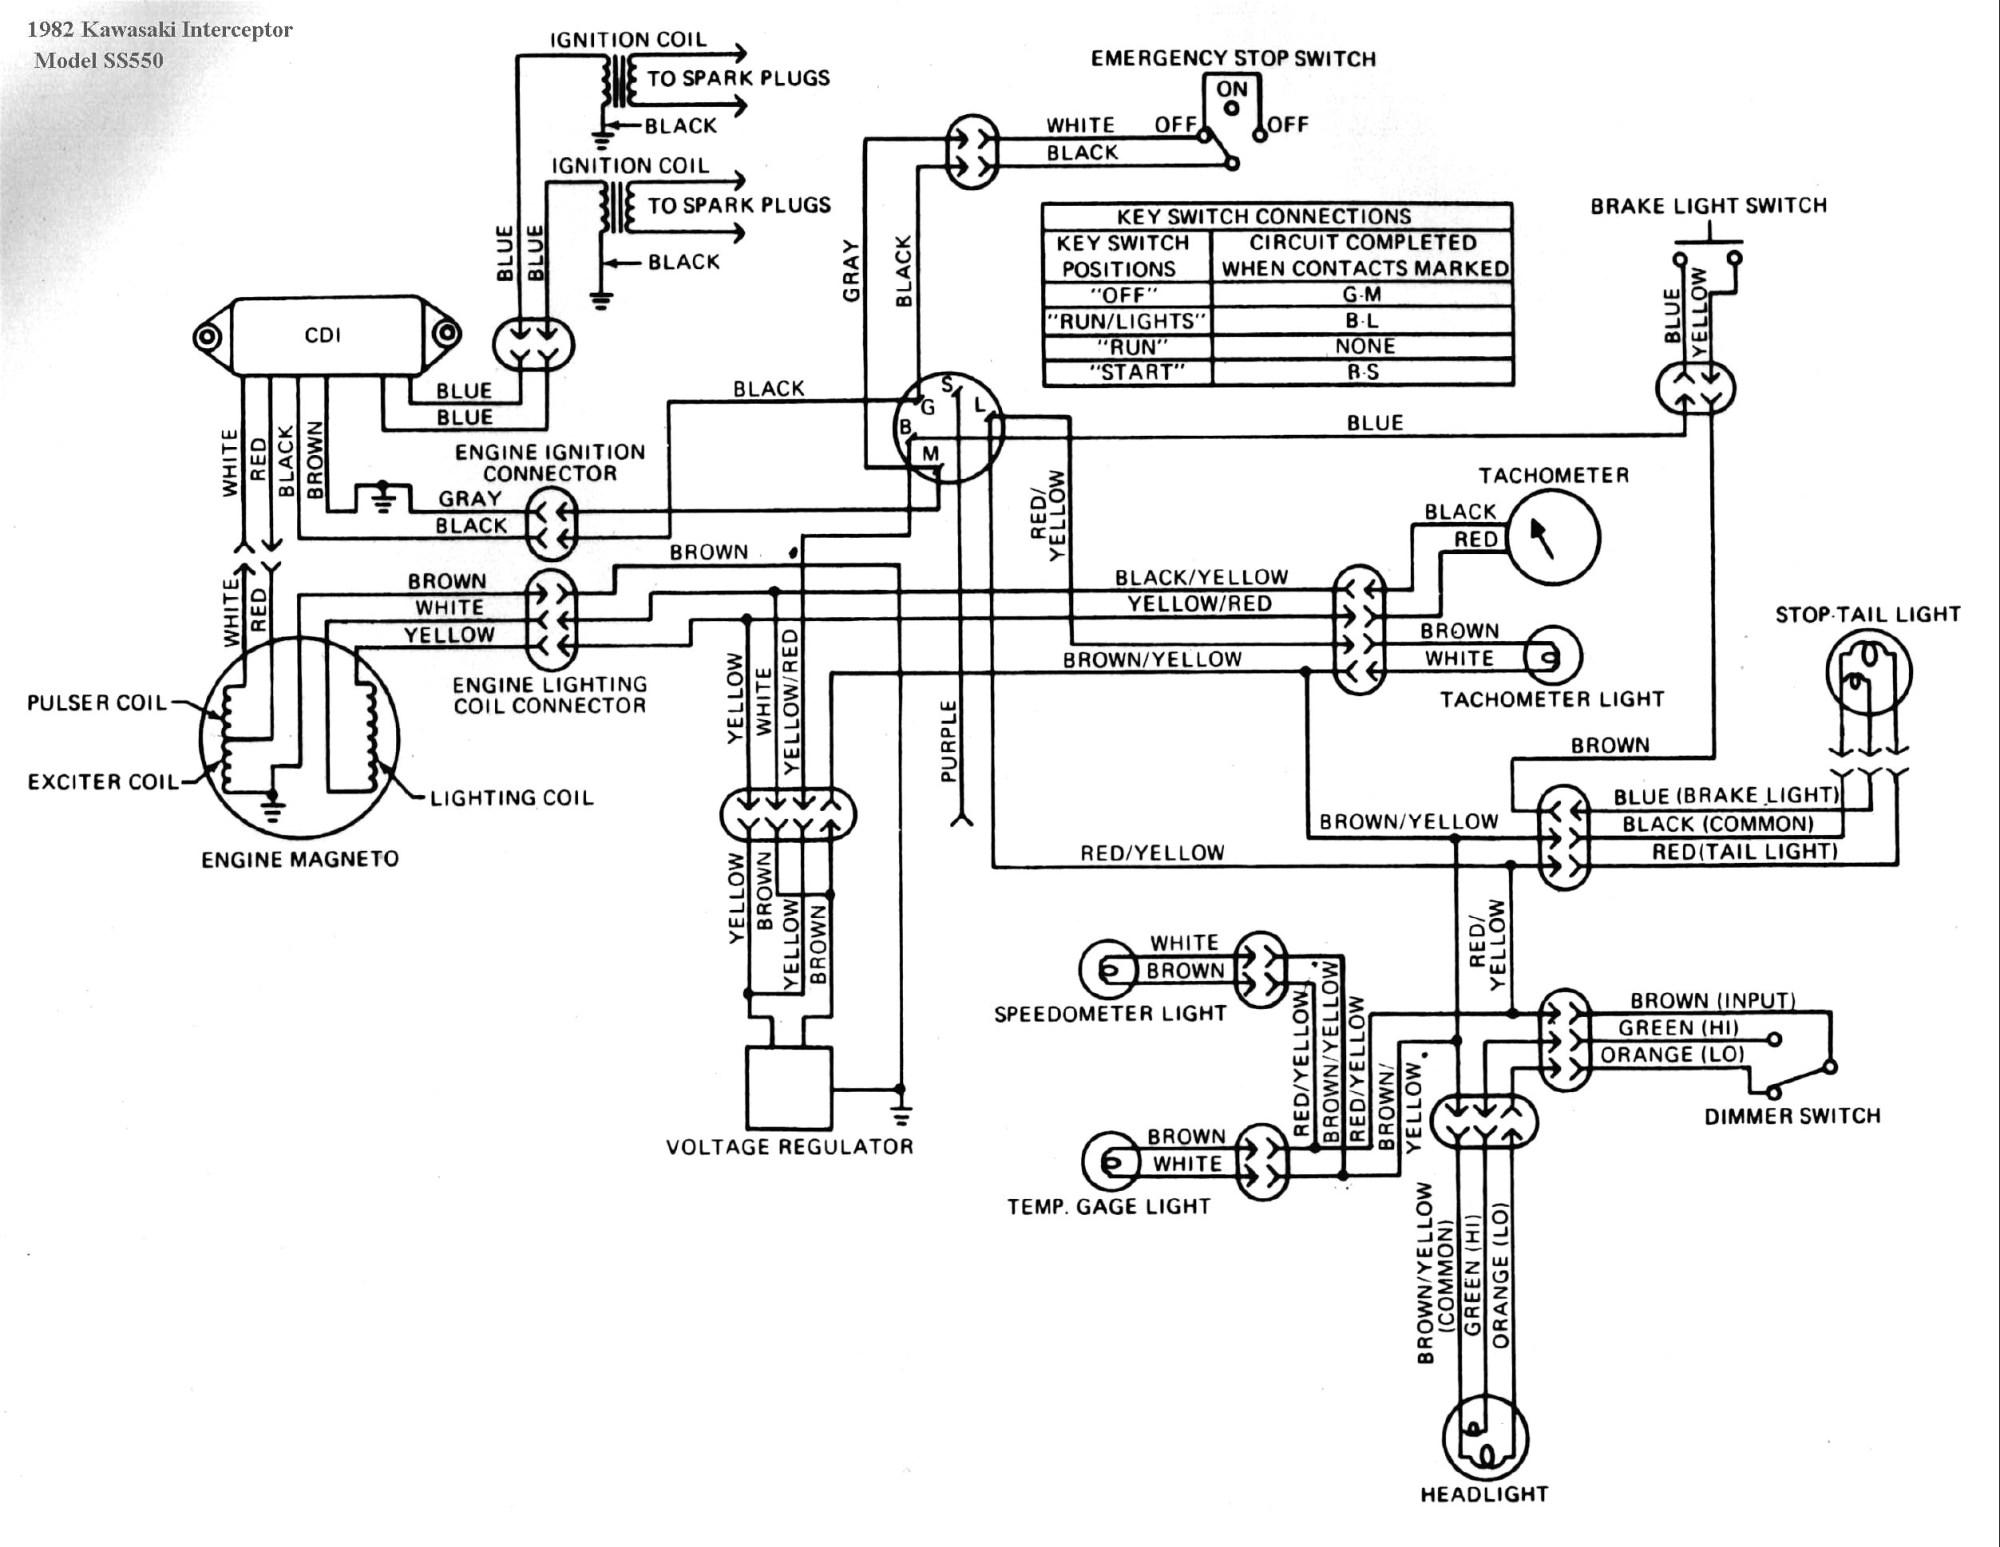 hight resolution of klr 650 wiring diagram wiring diagram basic kawasaki klr 650 wiring diagram